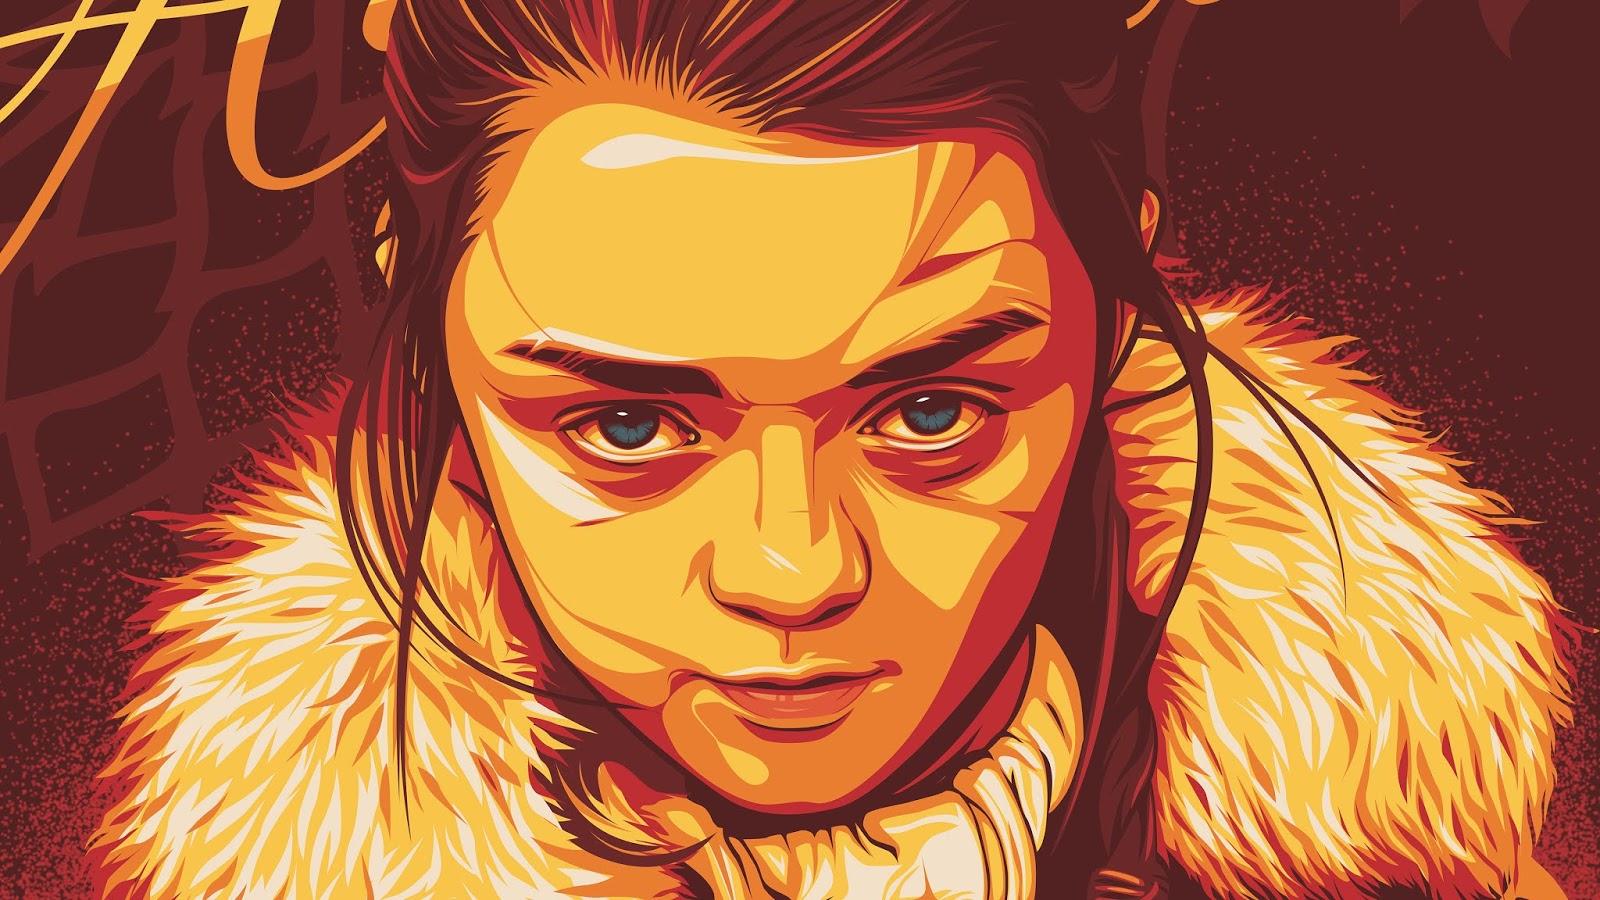 Game Of Thrones Ultra Hd 4k Wallpapers خلفيات مسلسل صراع العروش دقة عالية